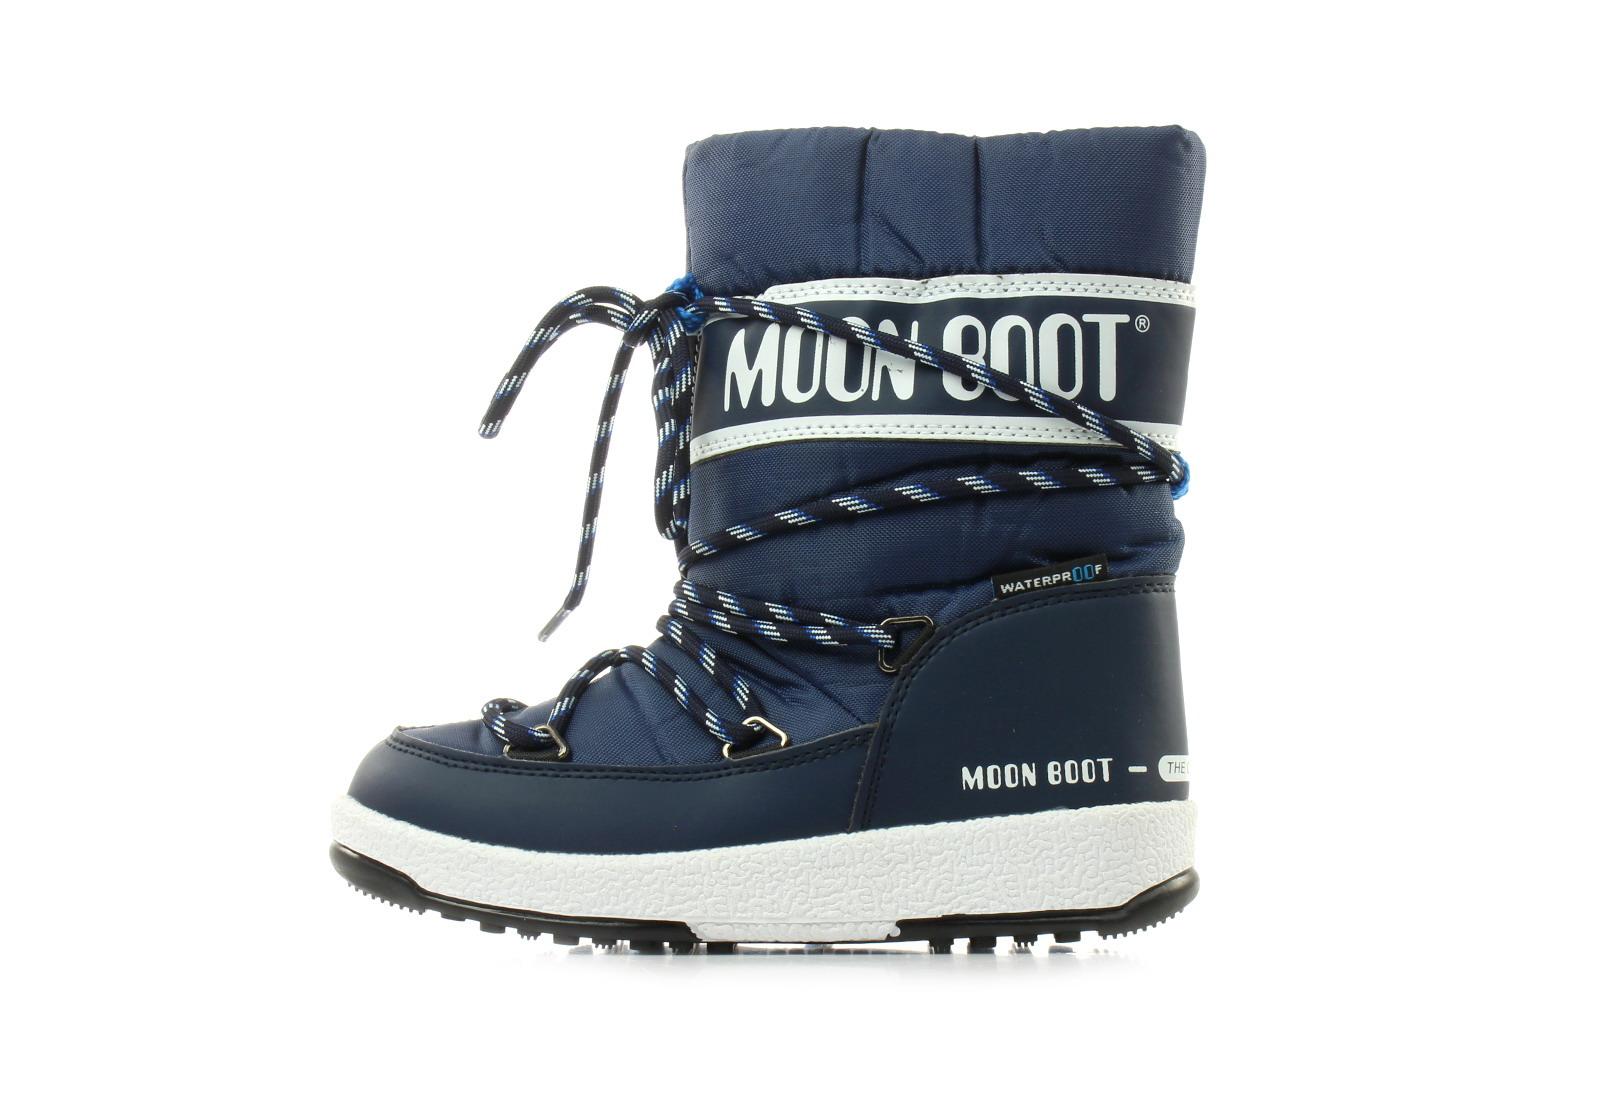 8a3672be5b4 Moon Boot Vysoké boty - Sport Wp - 34051300-002Tenisky